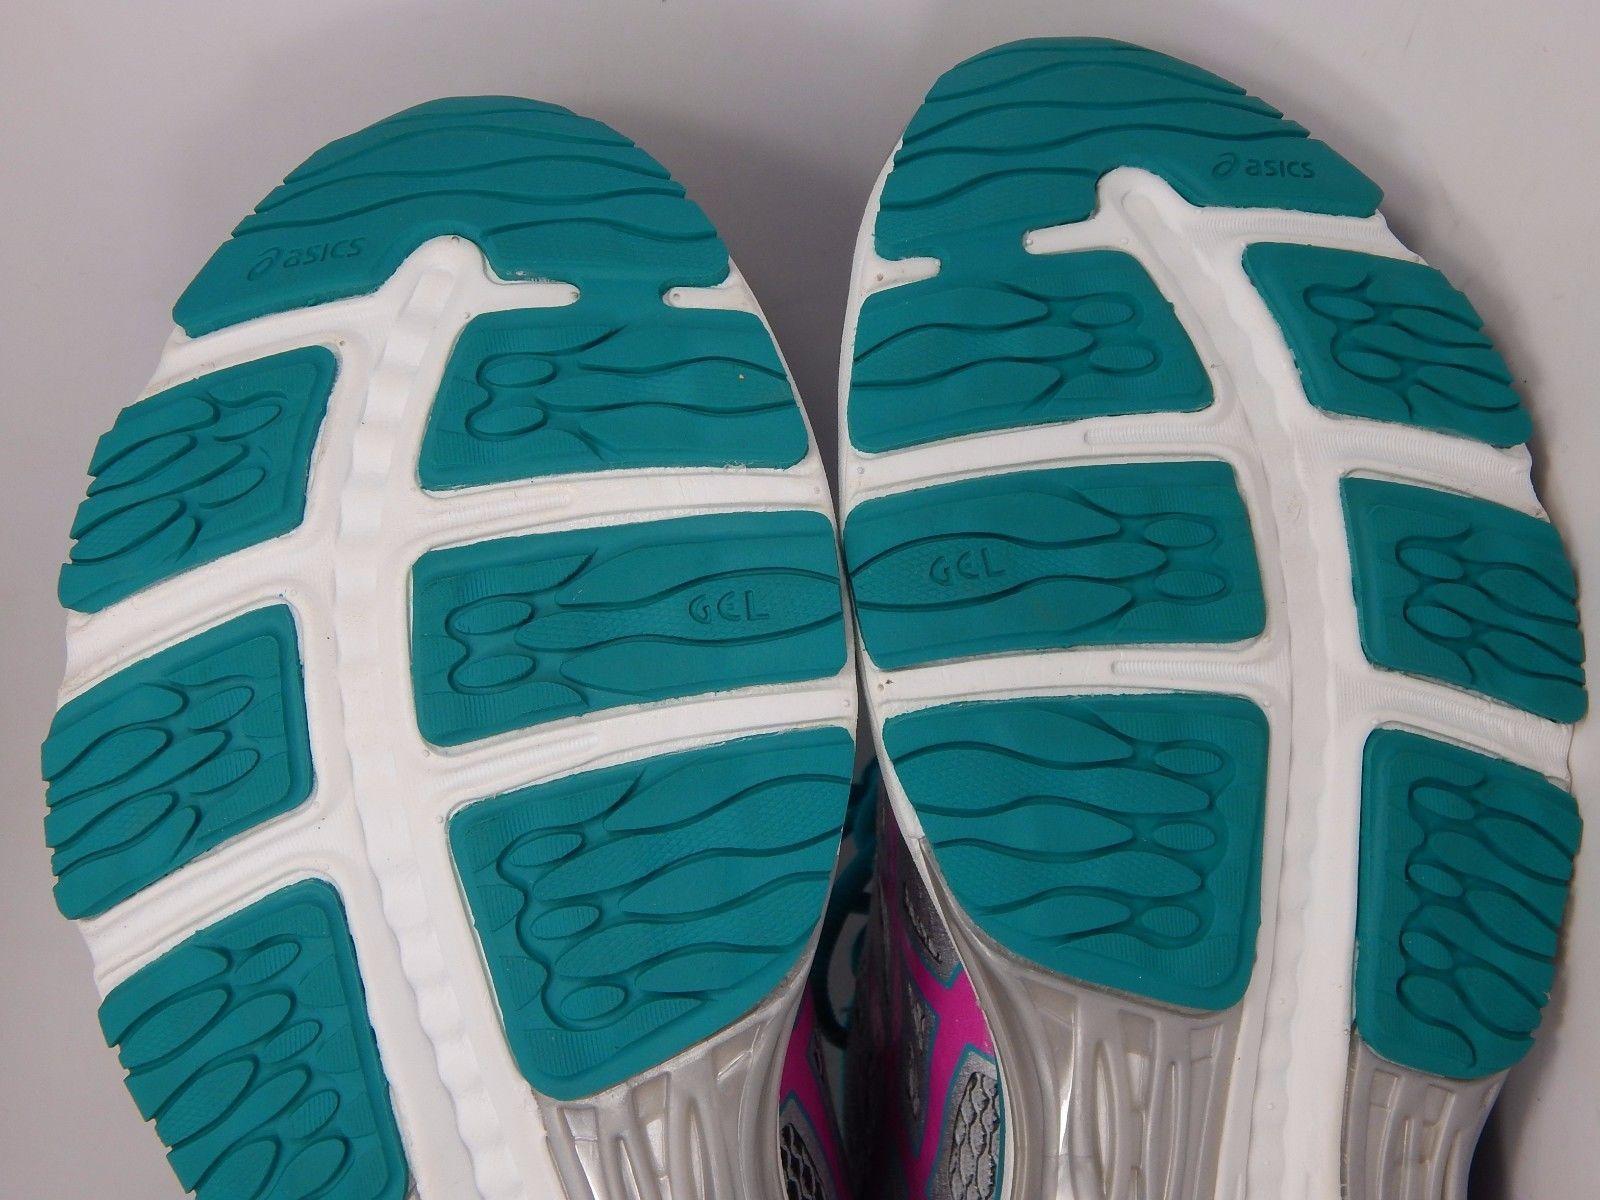 Asics Gel Cumulus 18 Women's Running Shoes Size US 12 M (B) EU 44.5 Silver T6C8N